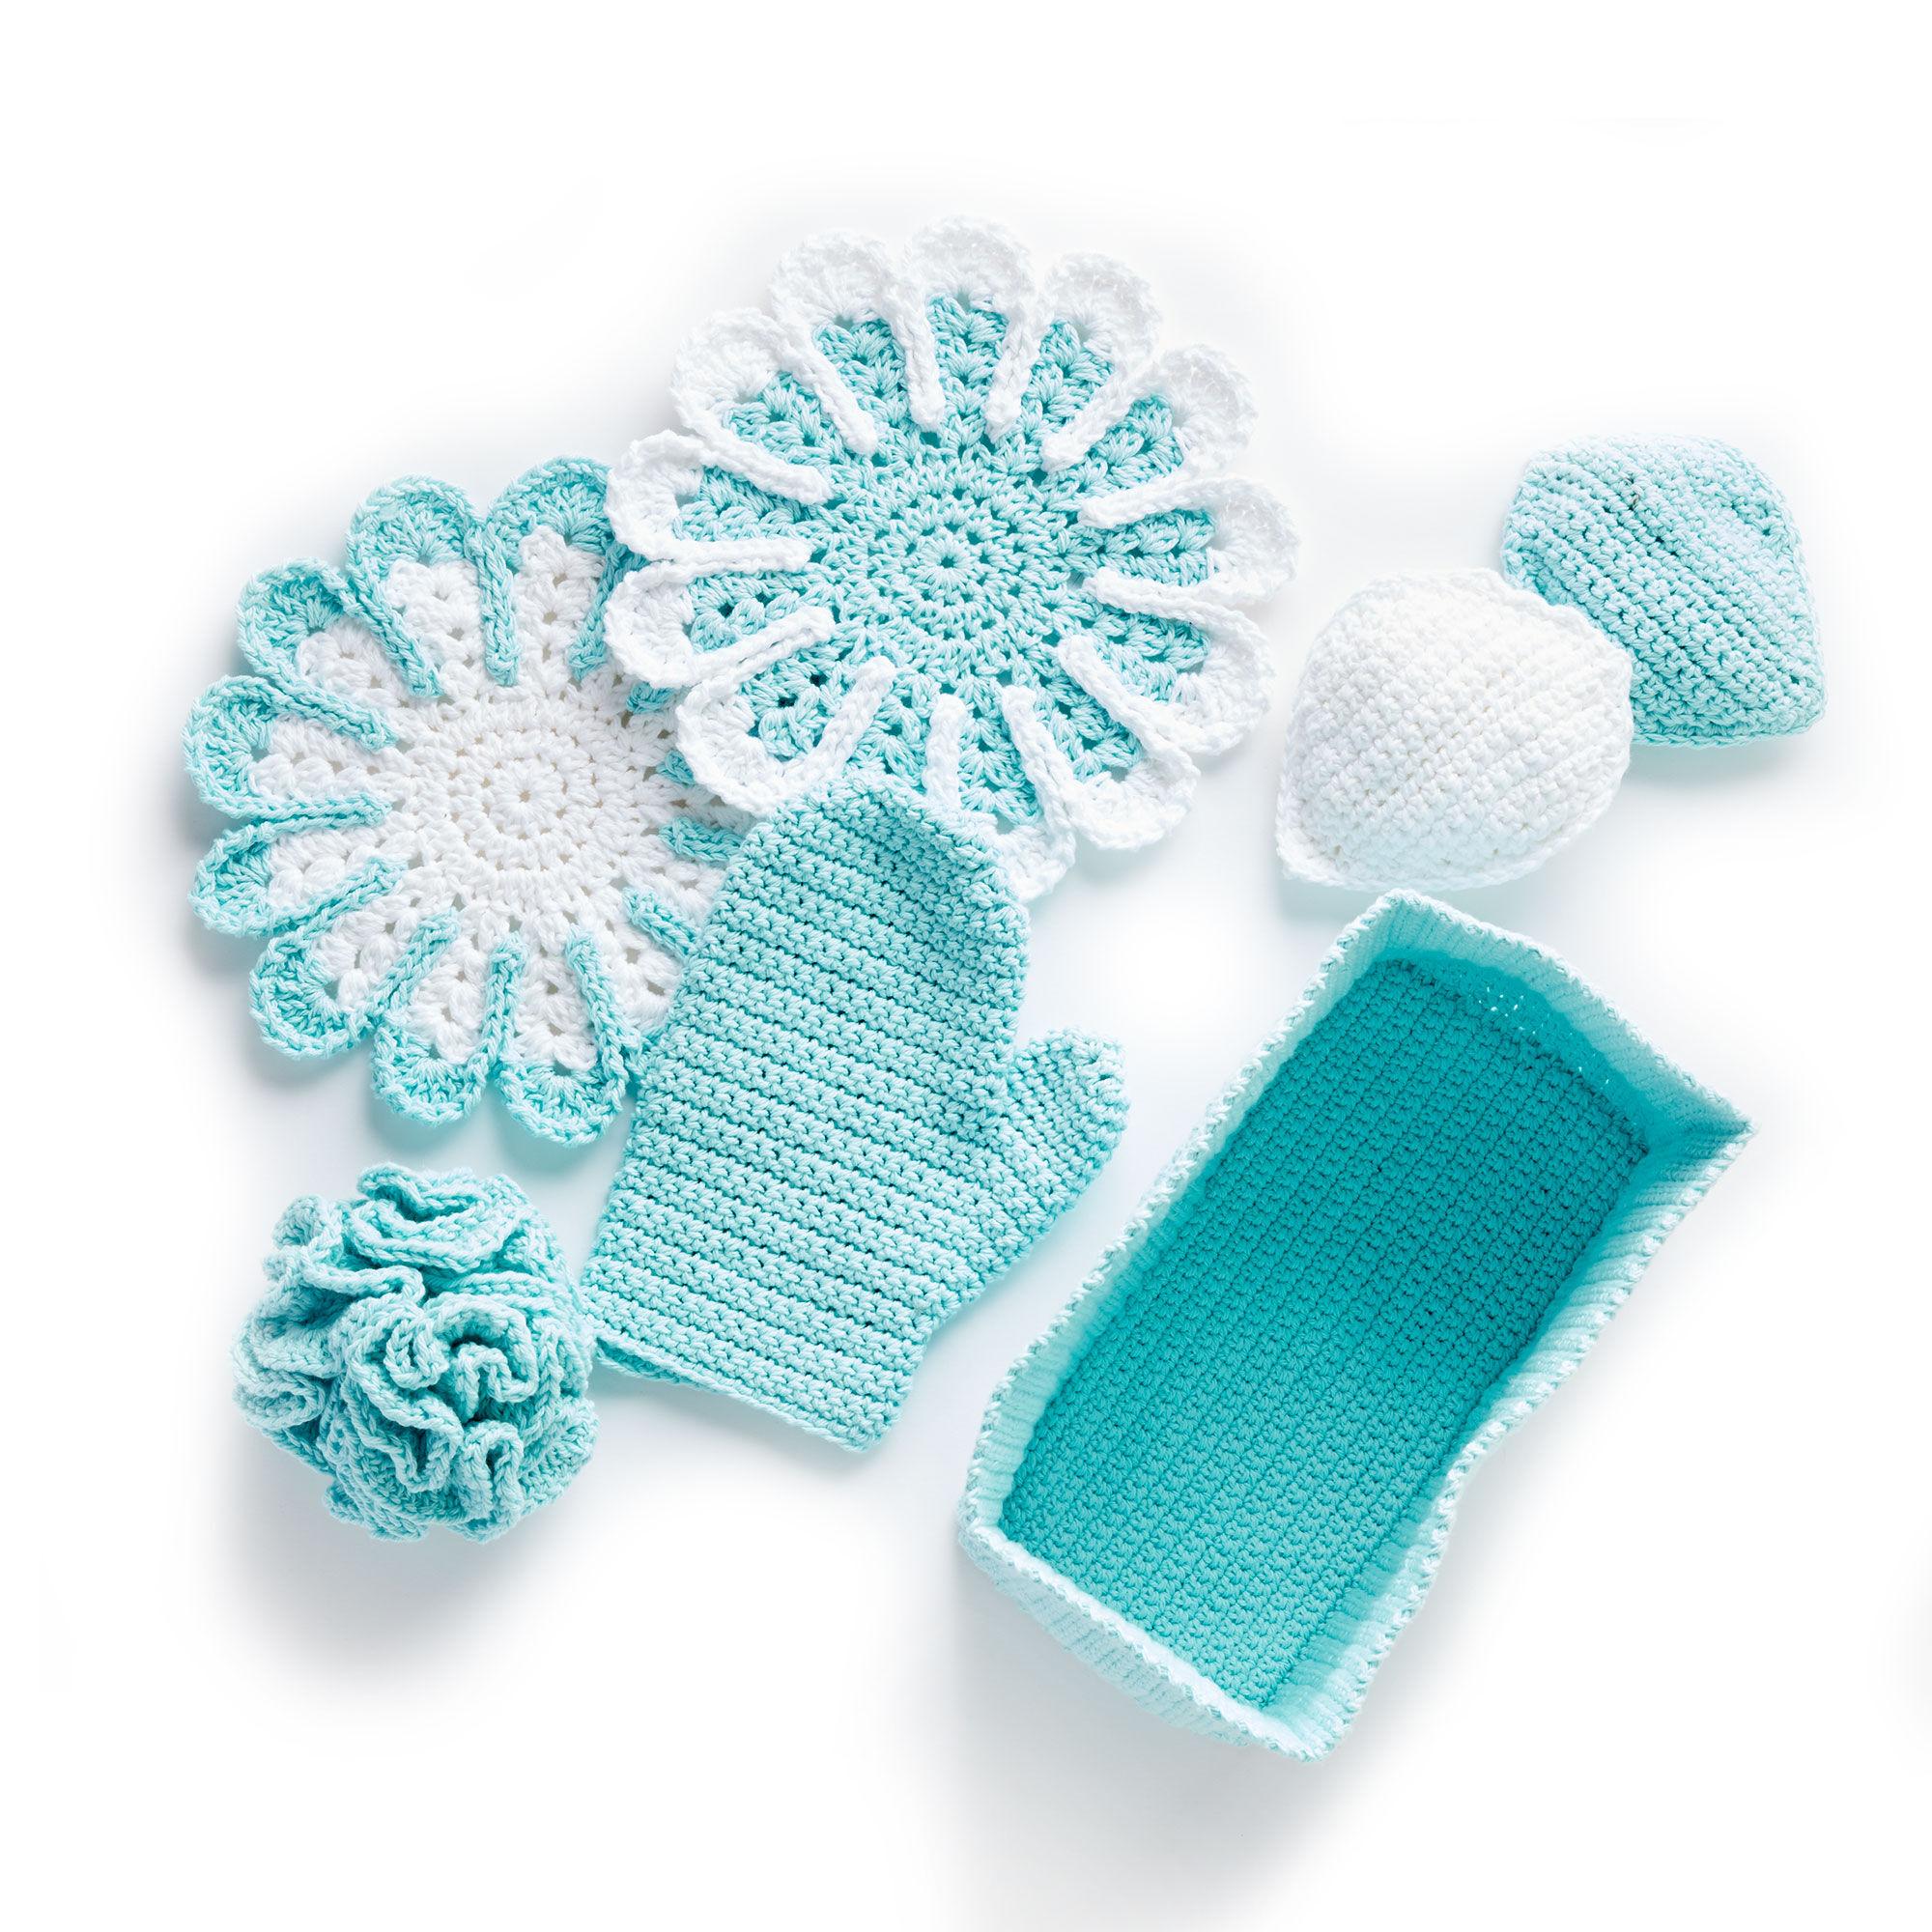 Bernat Crochet Spa Day Kit, Bath Mitt | Yarnspirations